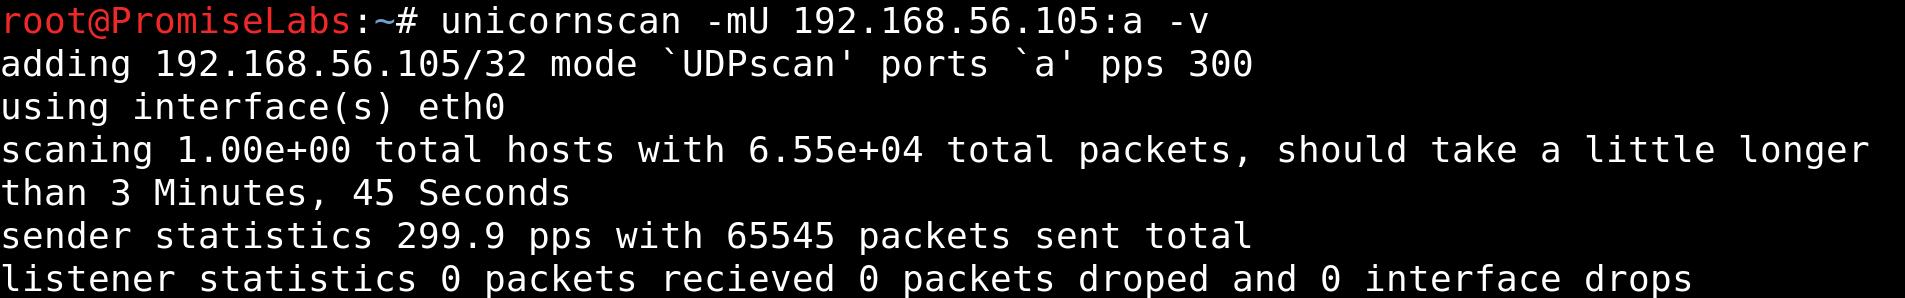 UDP Scan on taregt zico2 - vulnhub CTF walkthrough - d7x - PromiseLabs